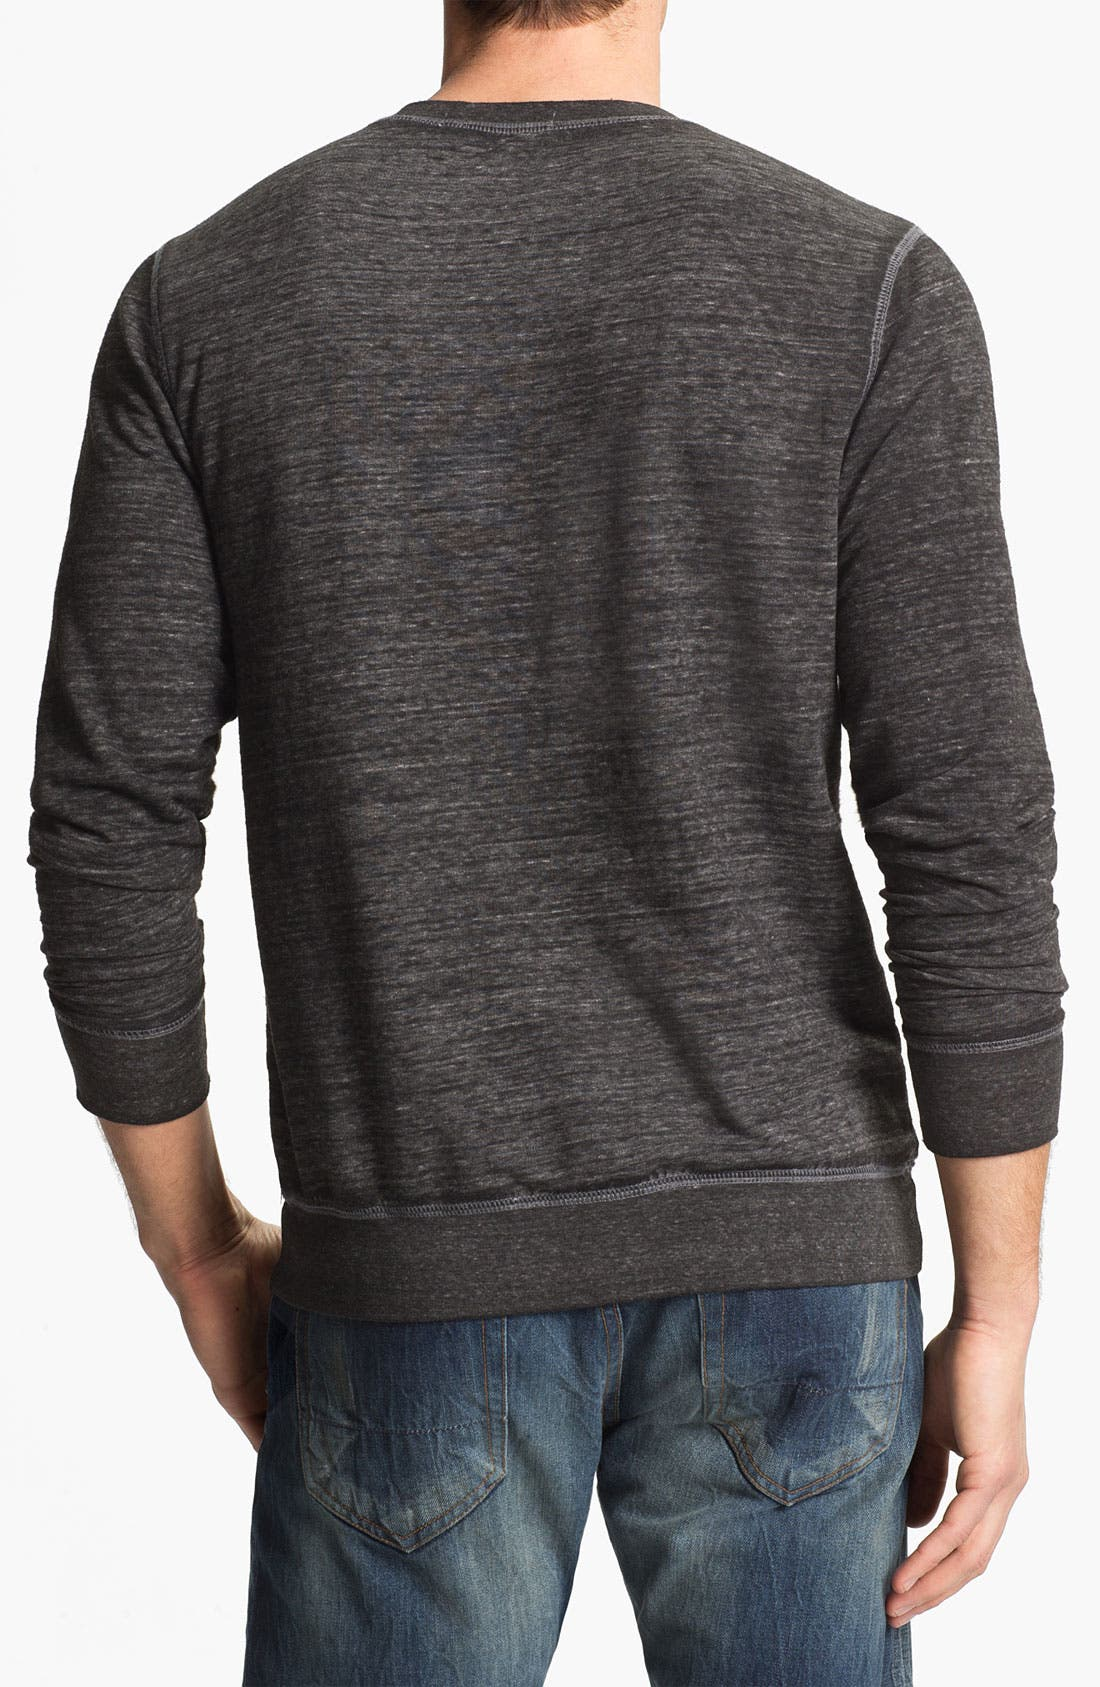 Alternate Image 2  - Threads for Thought Burnout Crewneck Sweatshirt